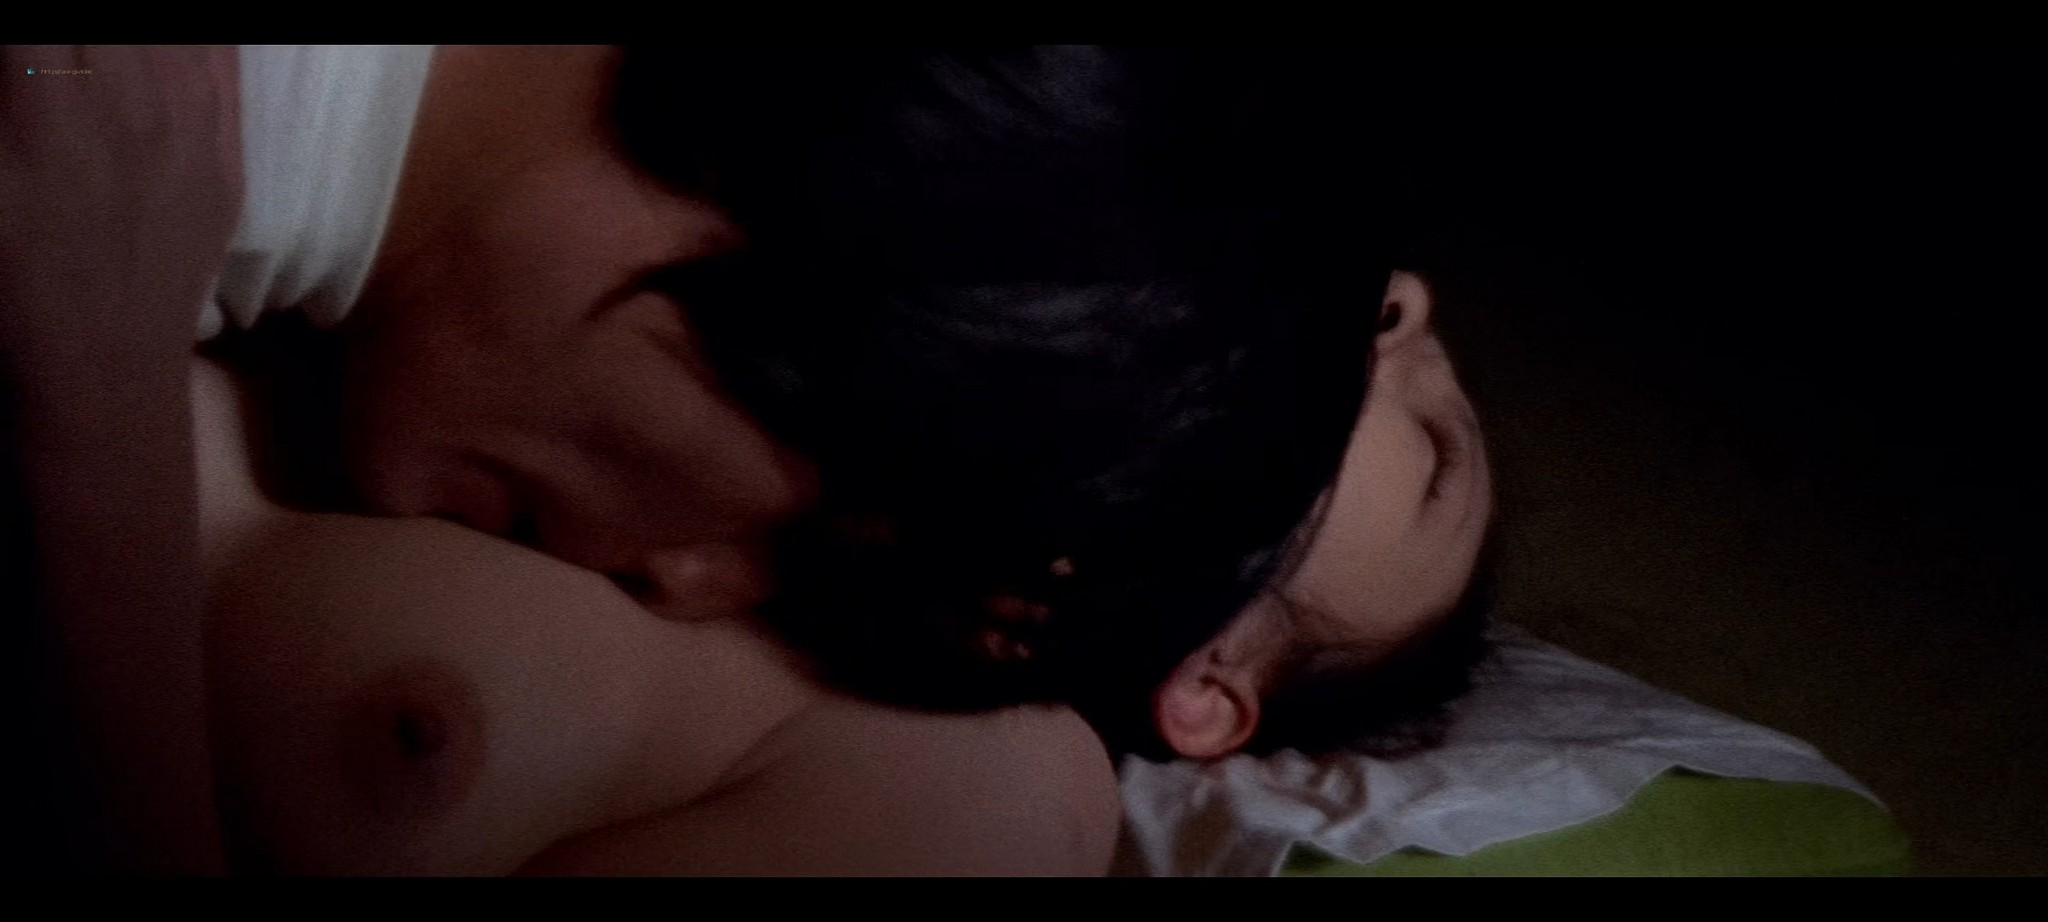 Hidemi Hara nude sex Mari Tanaka and other nude too Love Hunter JP 1972 HD 1080p BluRay REMUX 007